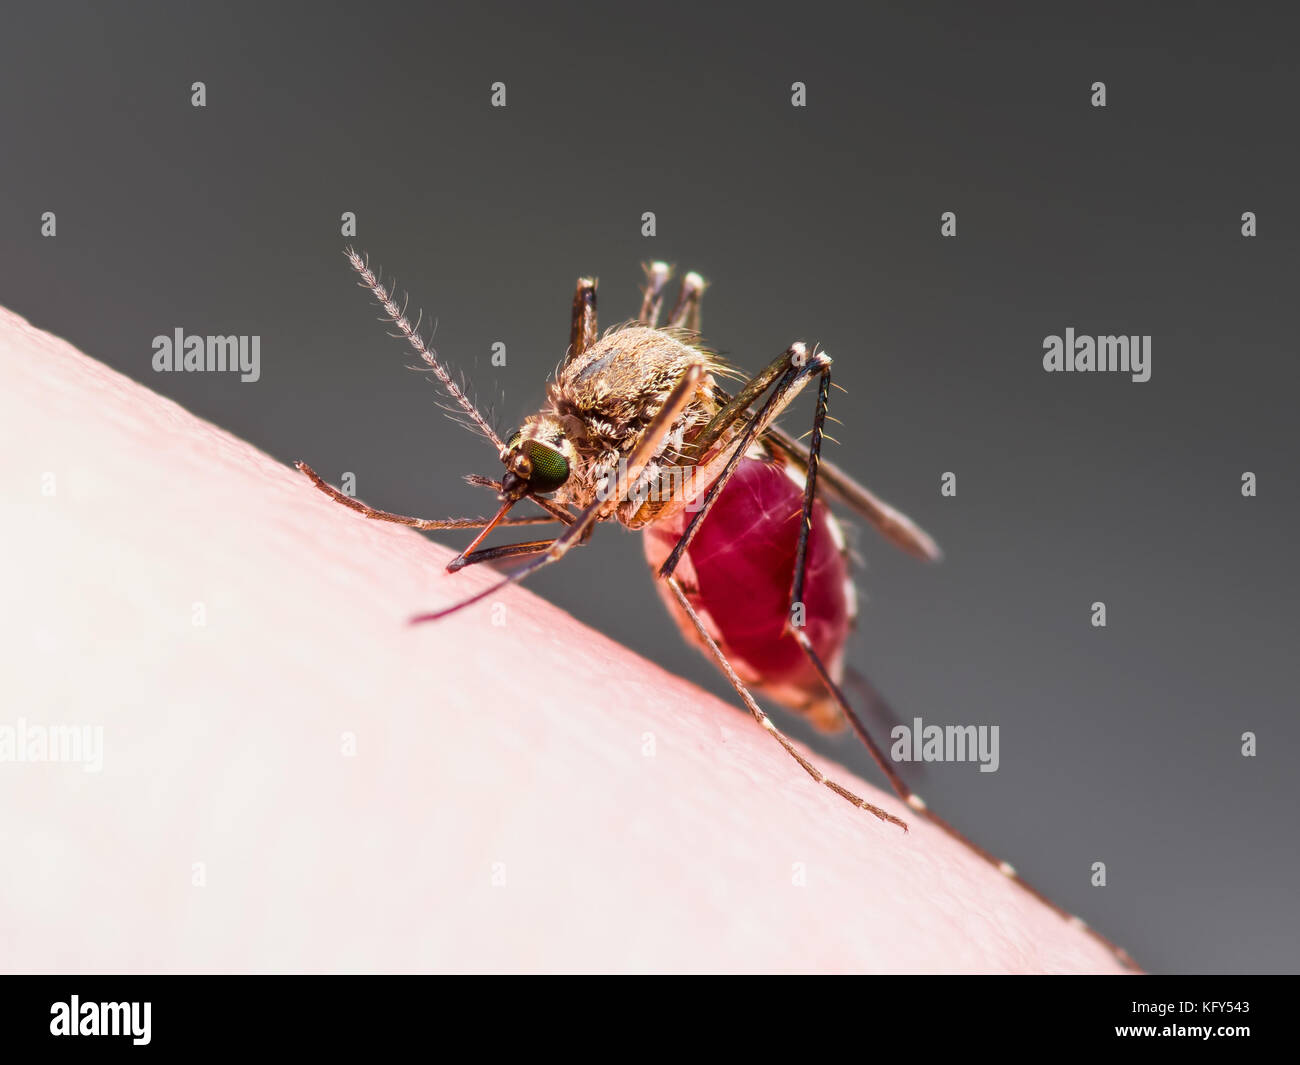 Gelbfieber, Malaria oder zika Virus infizierte Mücken Insekten Makro Stockbild